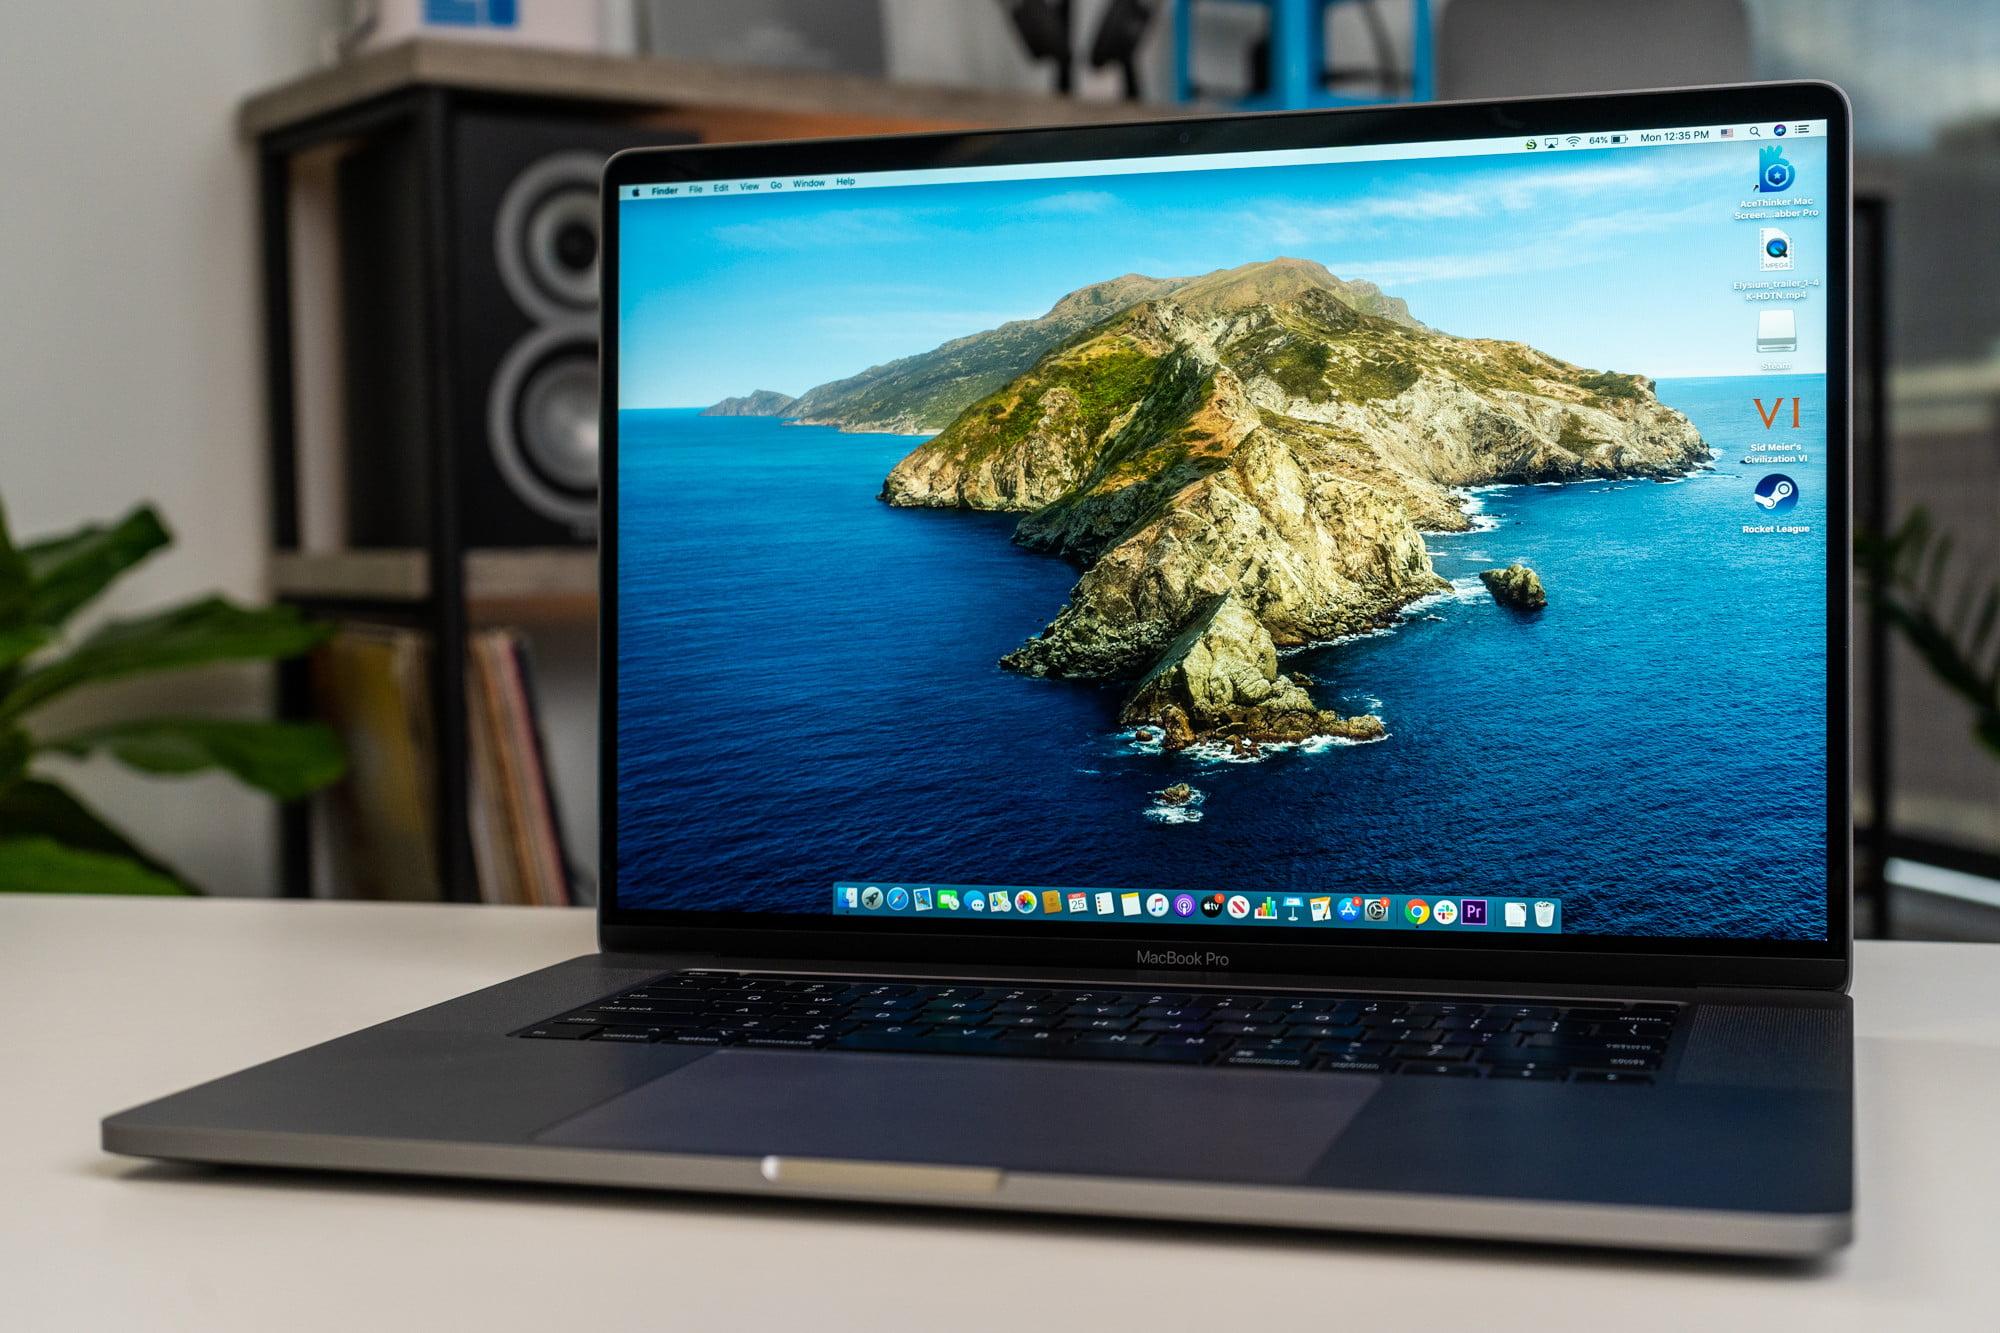 macbook-pro-lcd-screen-repair-irvine-pcexpertservices